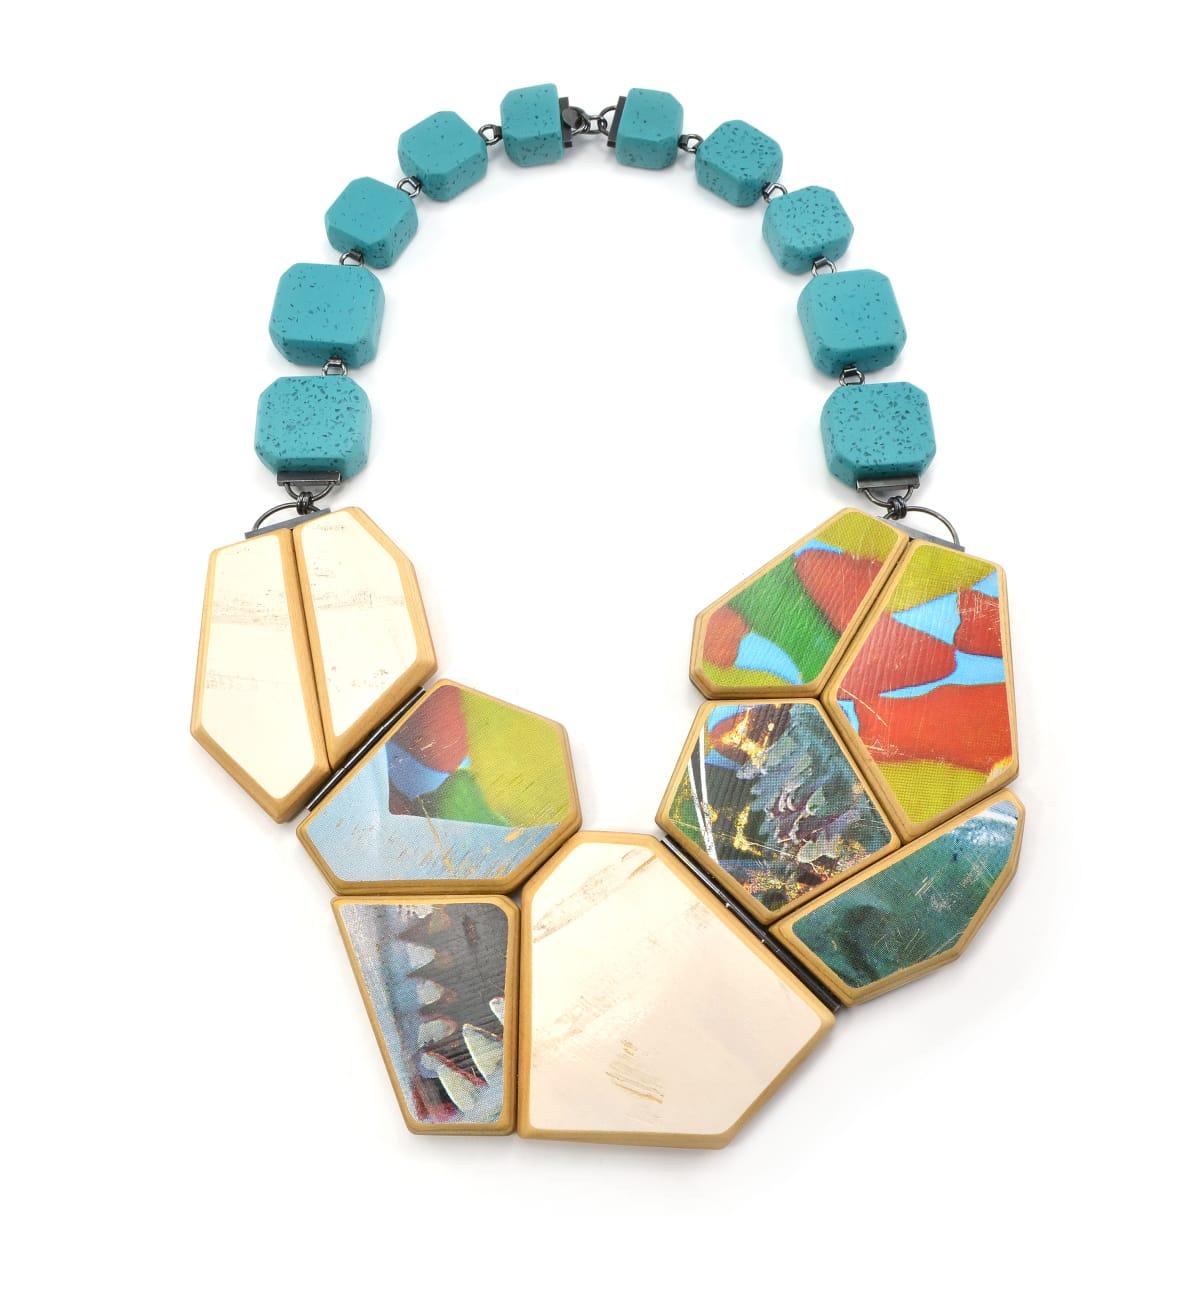 Tara Locklear, Foundation Collection ed #18 Necklace, 2018